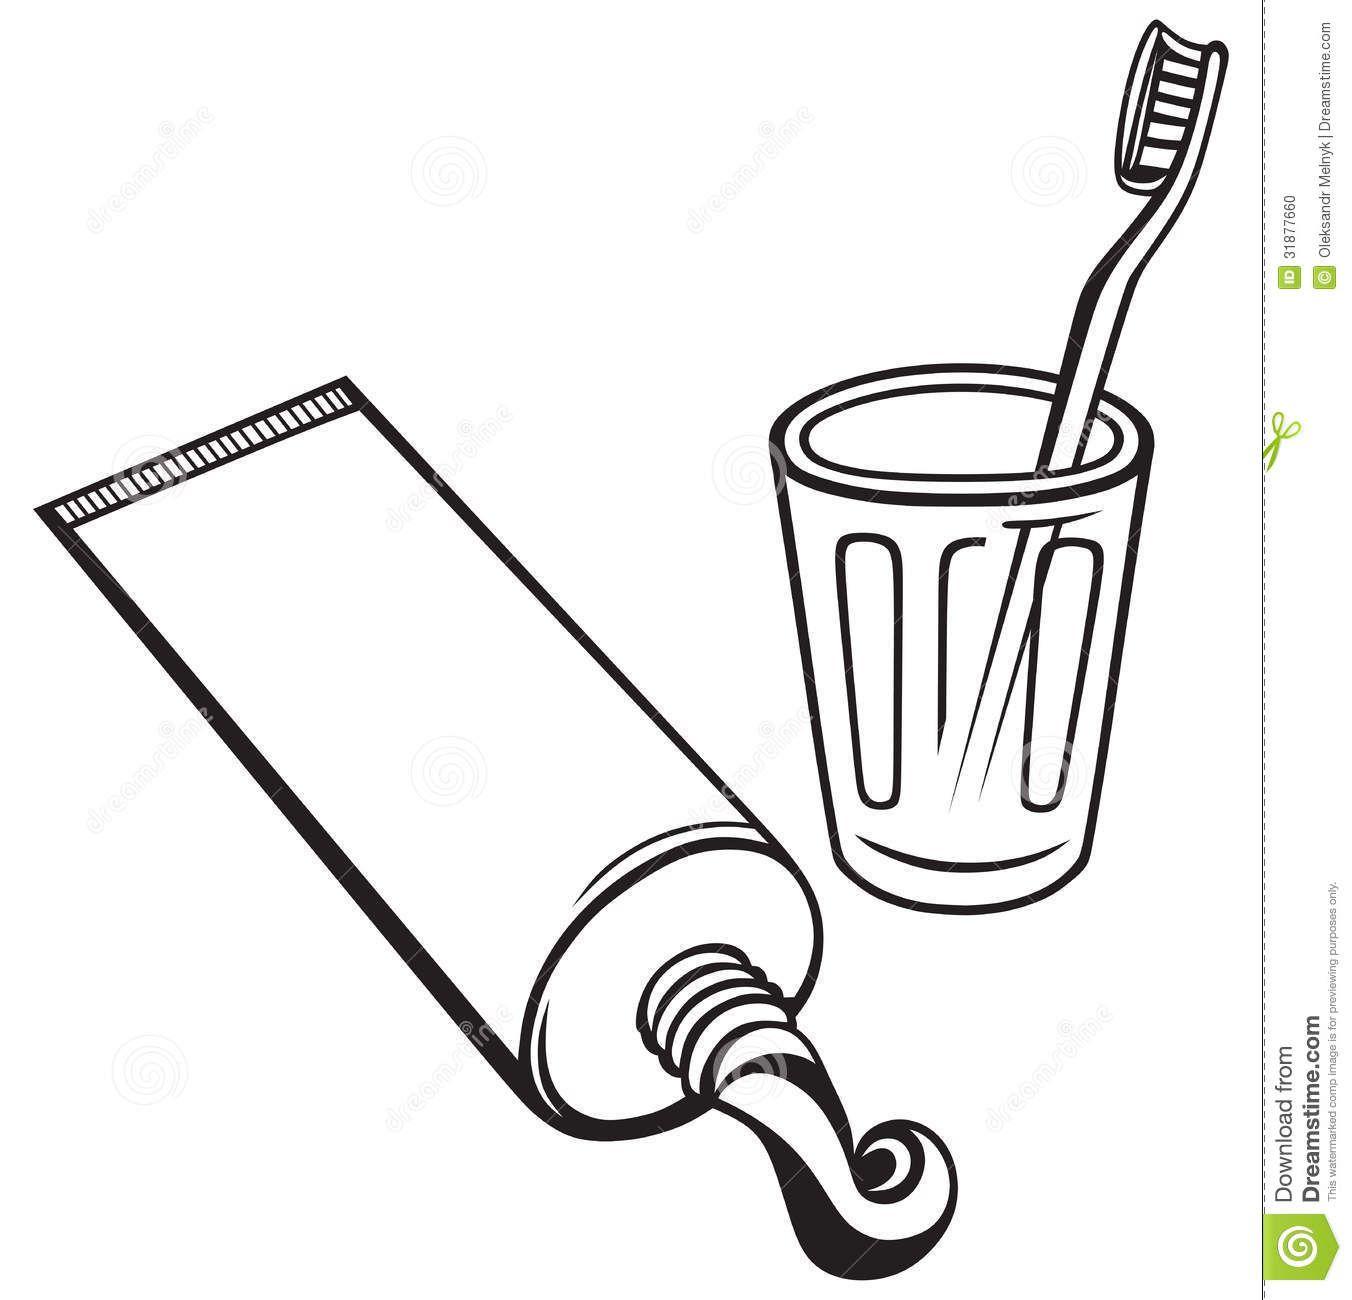 Outline Toothbrush Clip Art